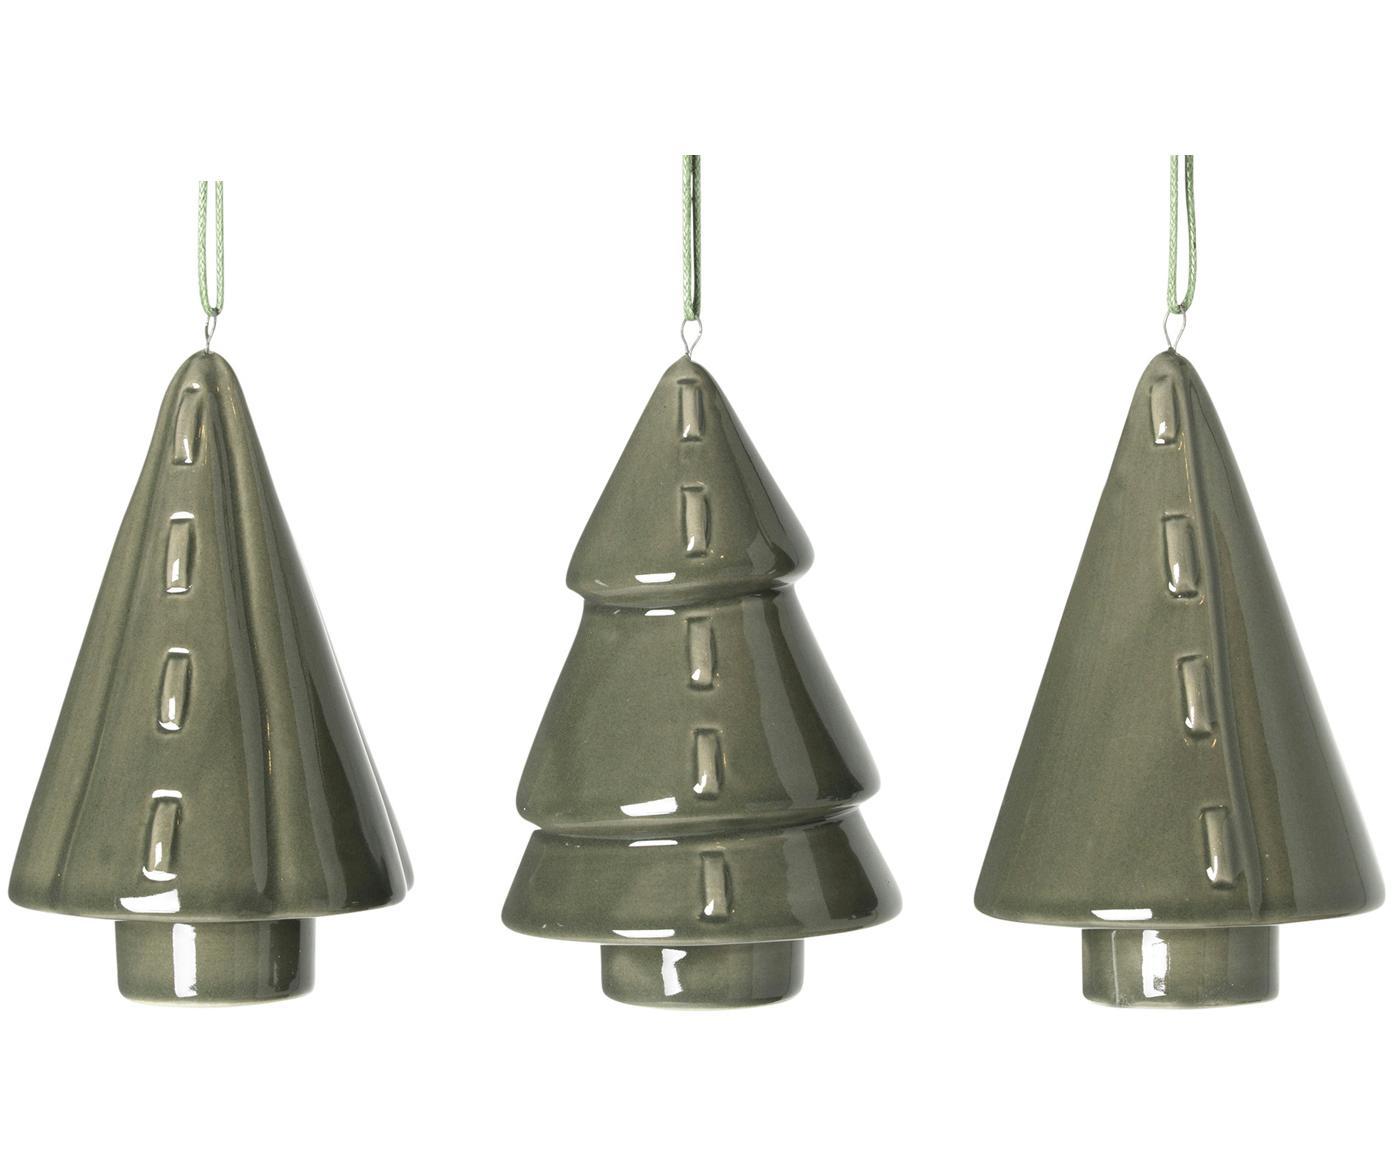 Kerstboomhangersset Trees, 3-delig, Porselein, Donkergroen, Ø 5 x H 9 cm